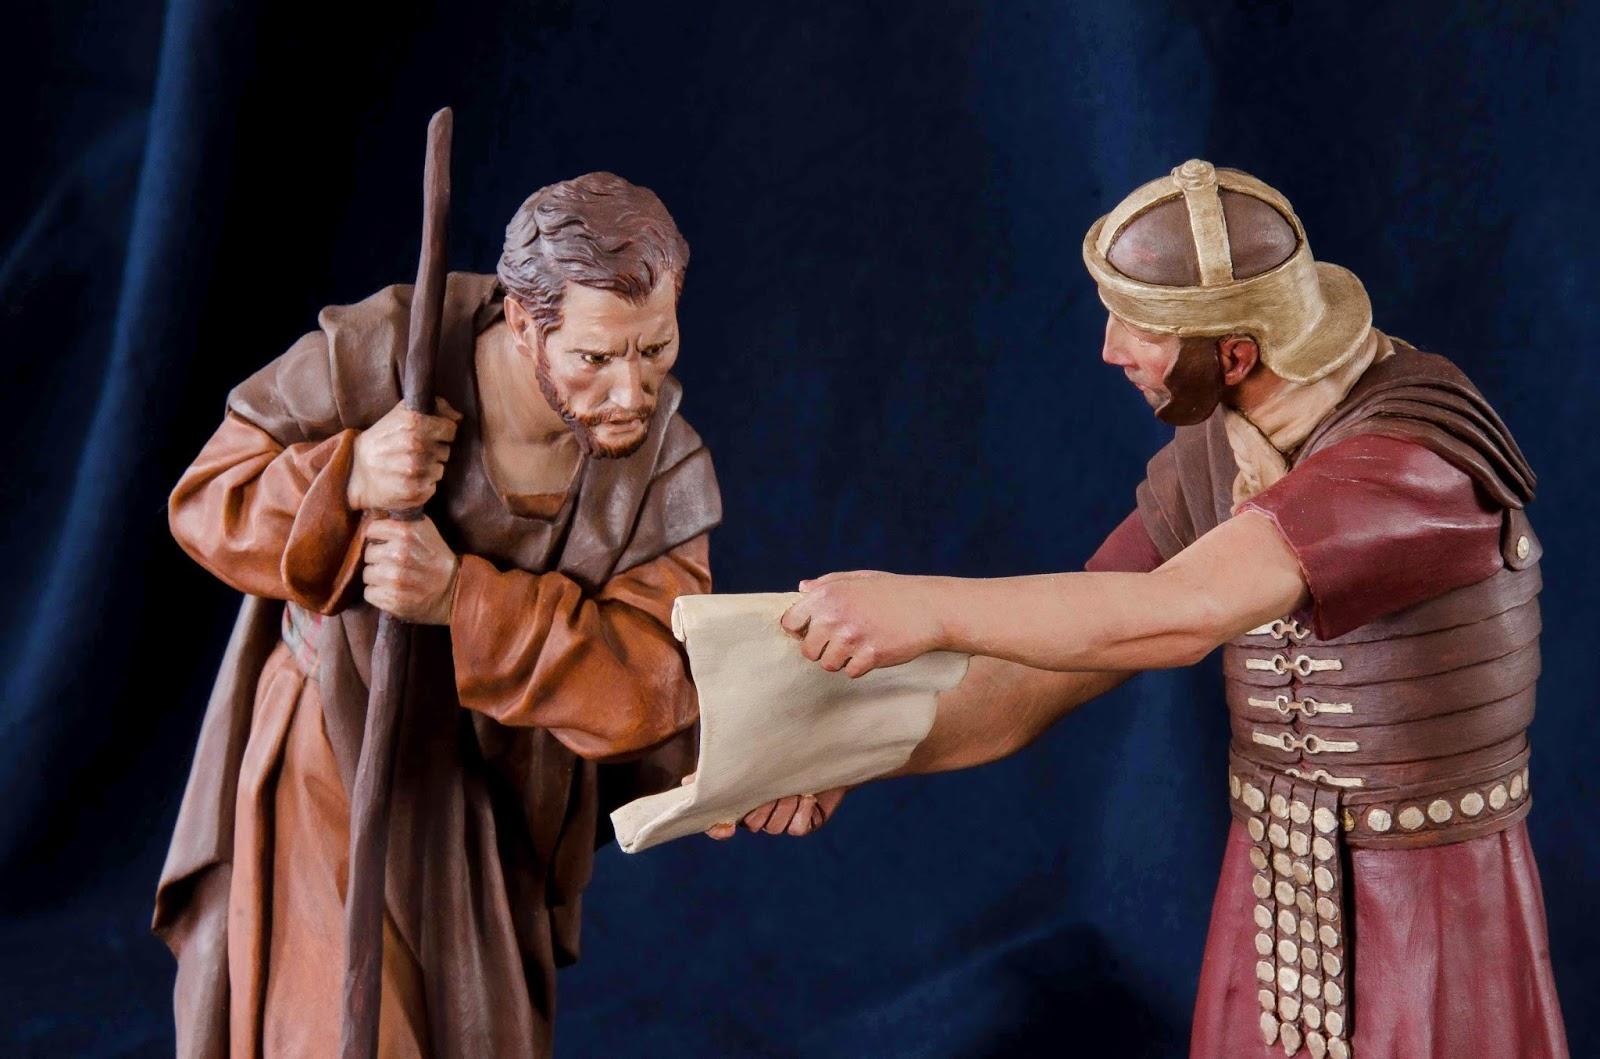 Belén presepe nativity krippe Arturo Serra escultura barro cocido 13